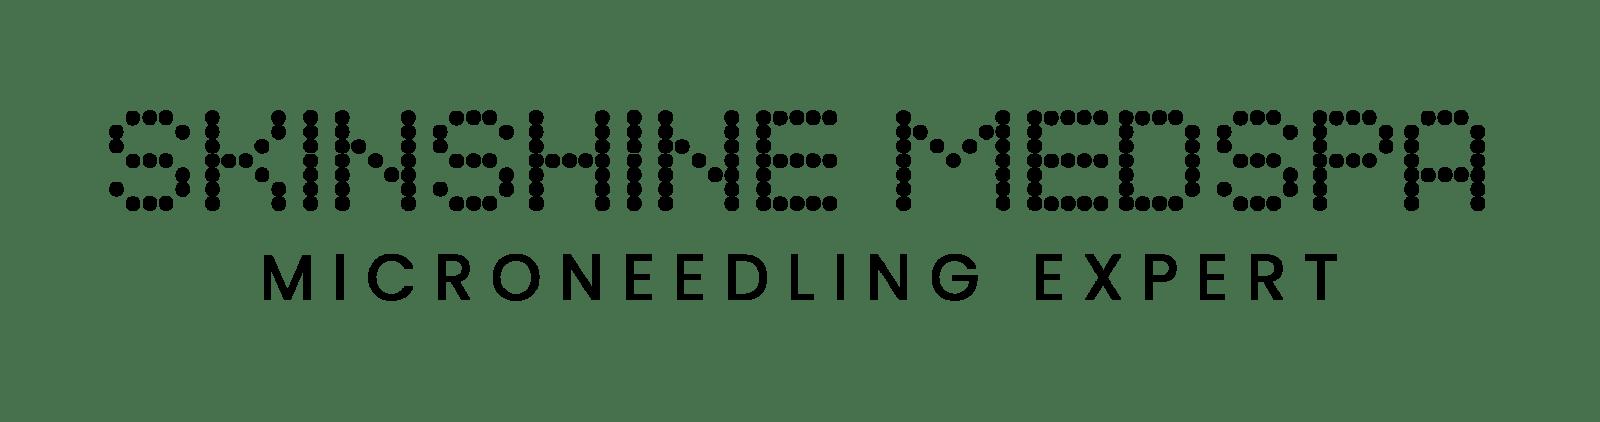 Microneedling Expert – 347.952.4743